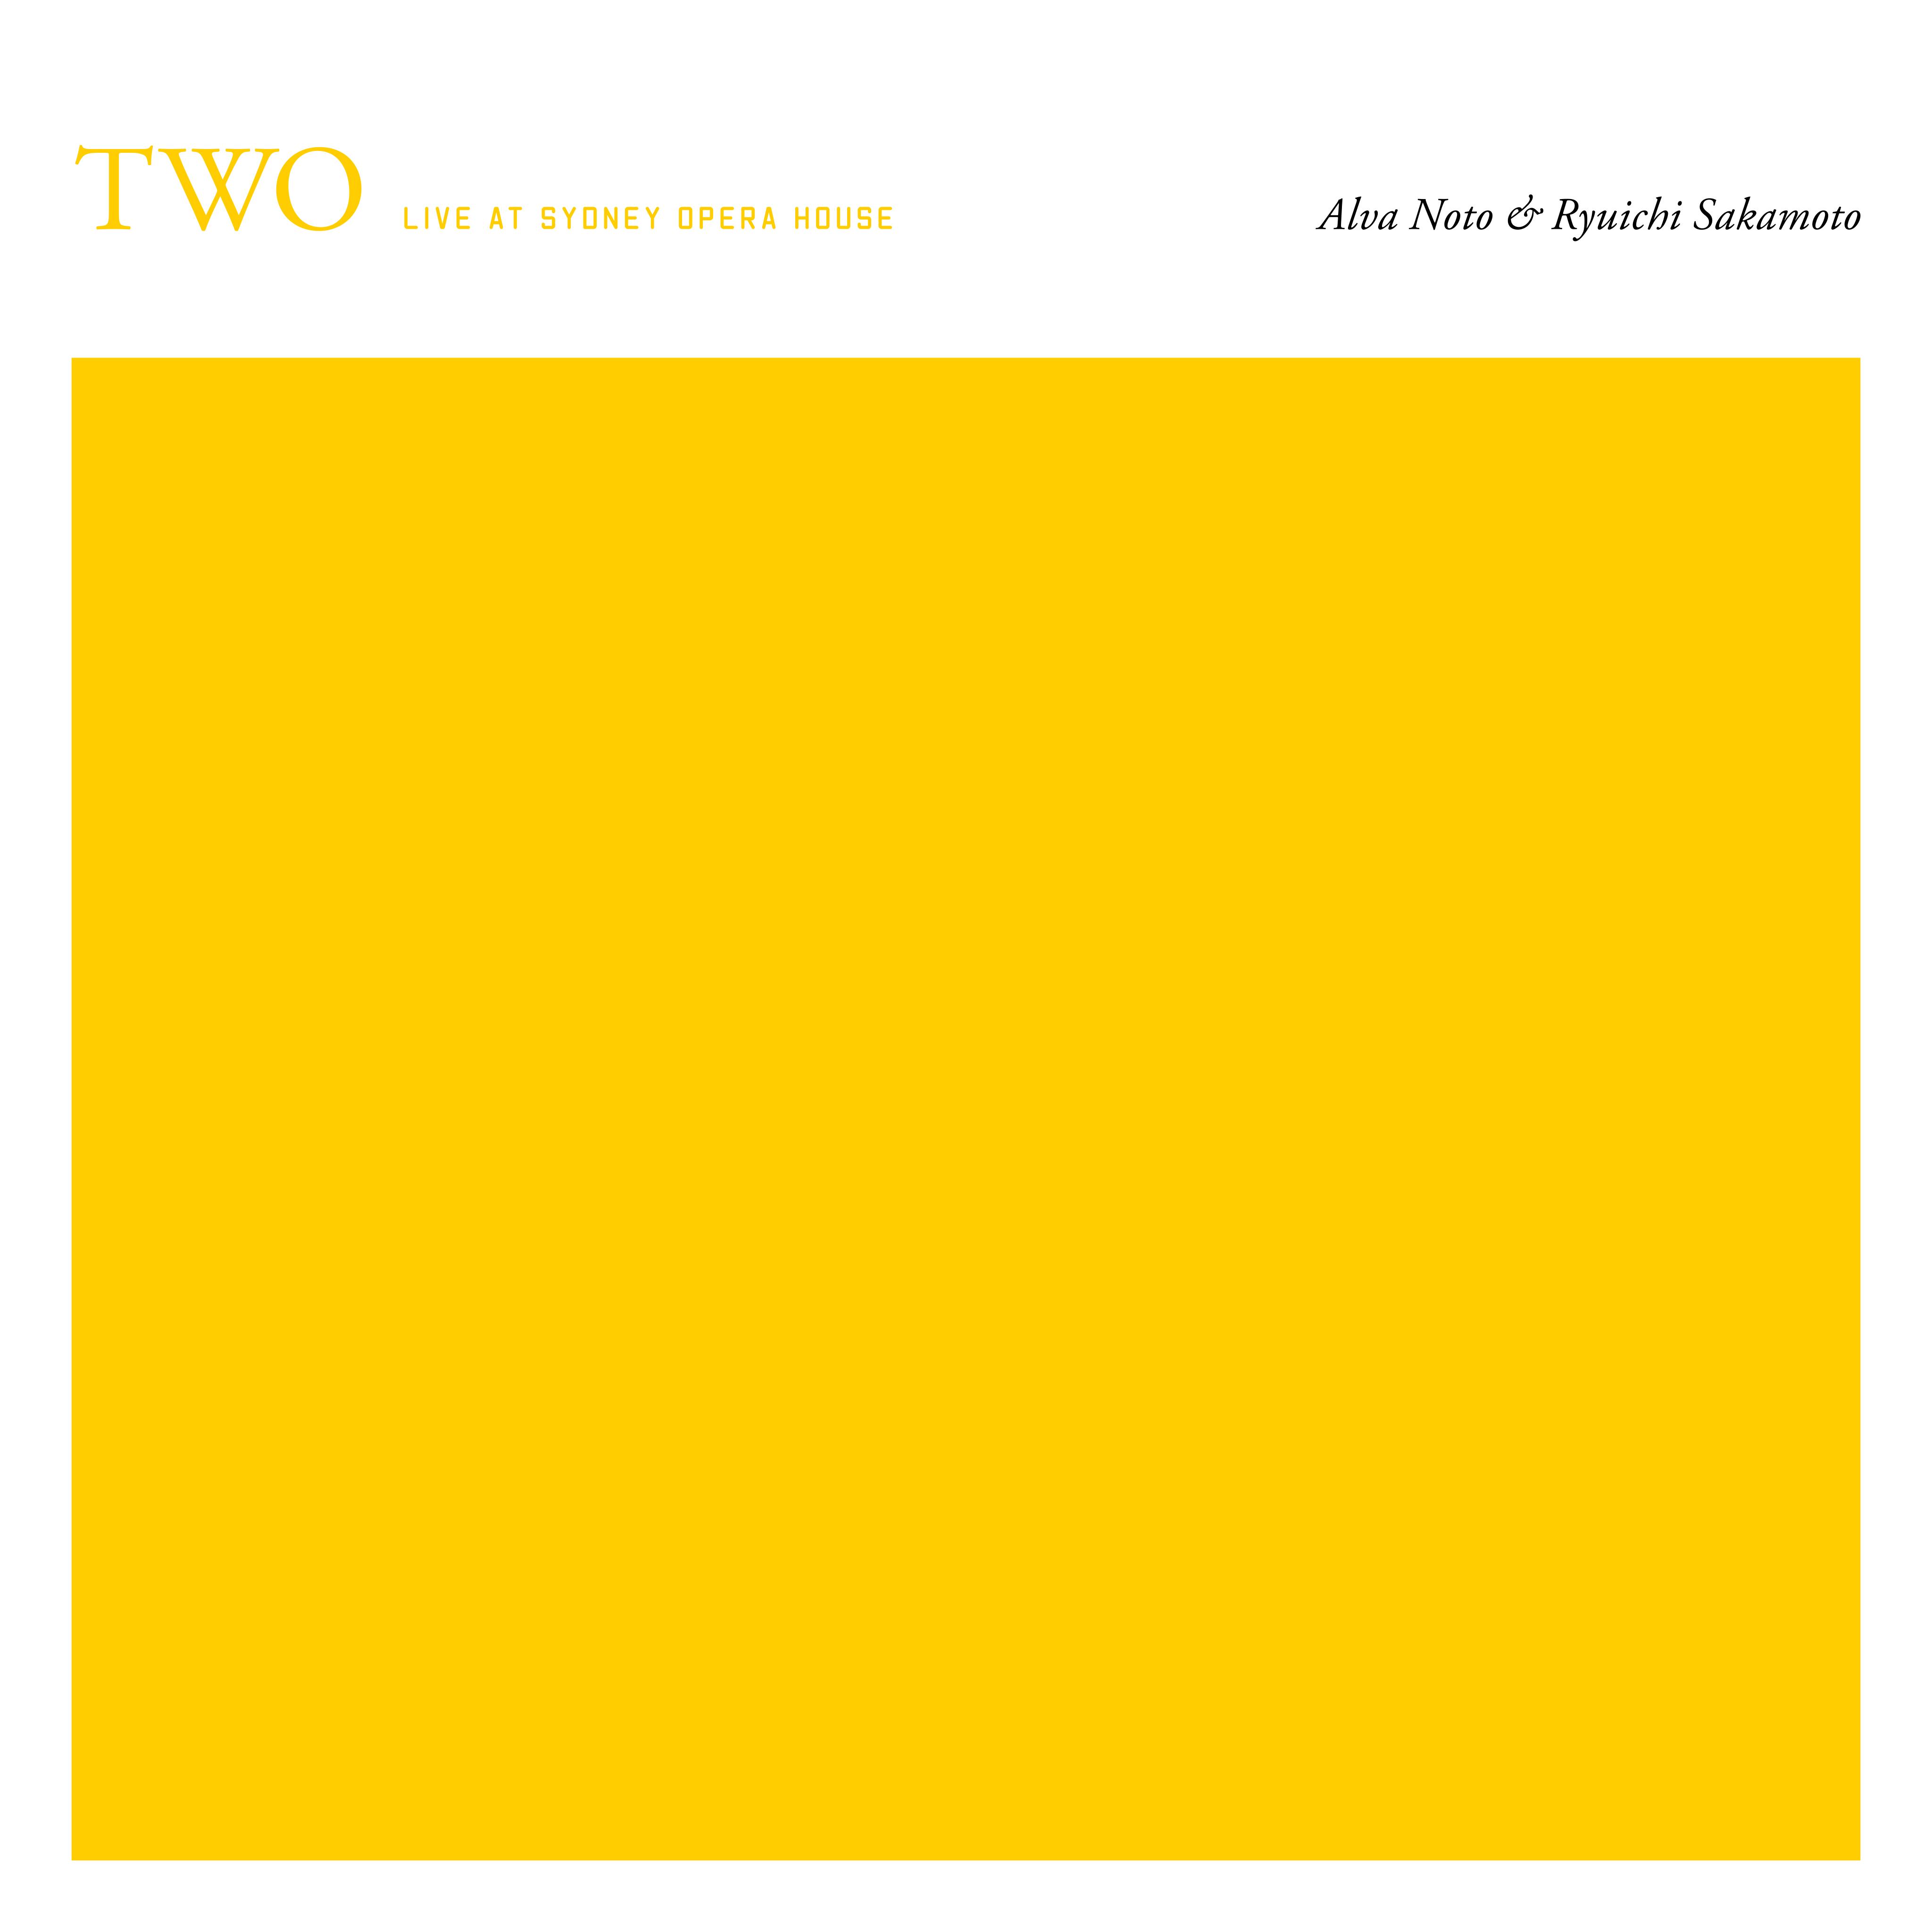 Ryuichi Sakamoto & Alva Noto to release live album TWO